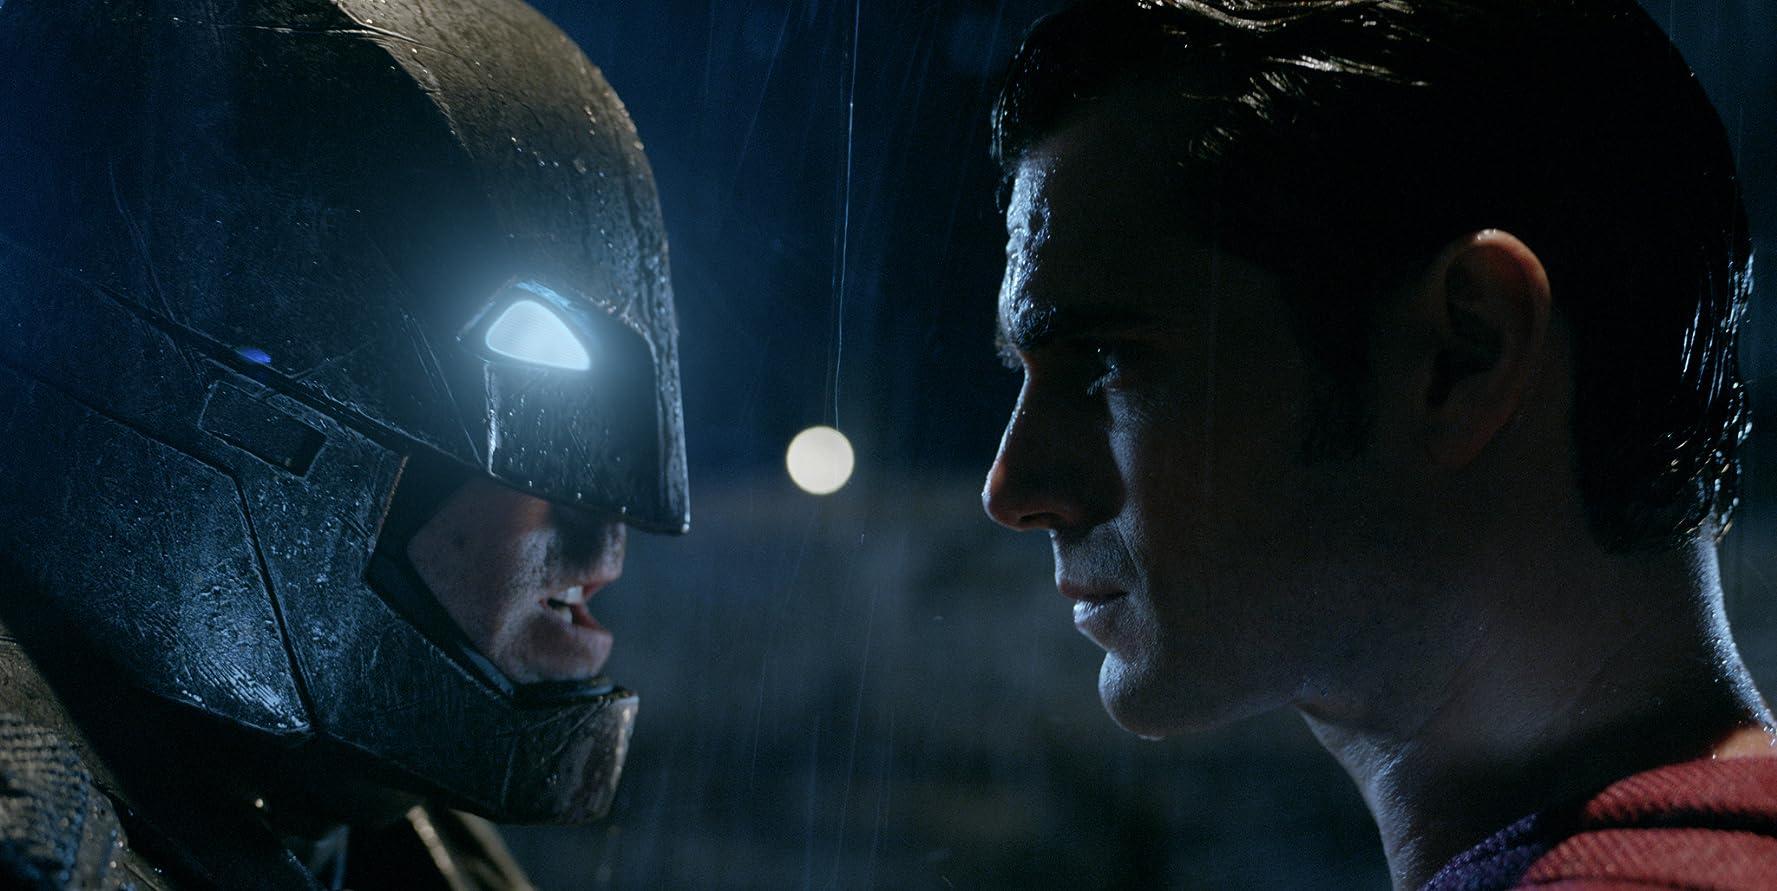 Ben Affleck and Henry Cavill in Batman v Superman: Dawn of Justice (2016)